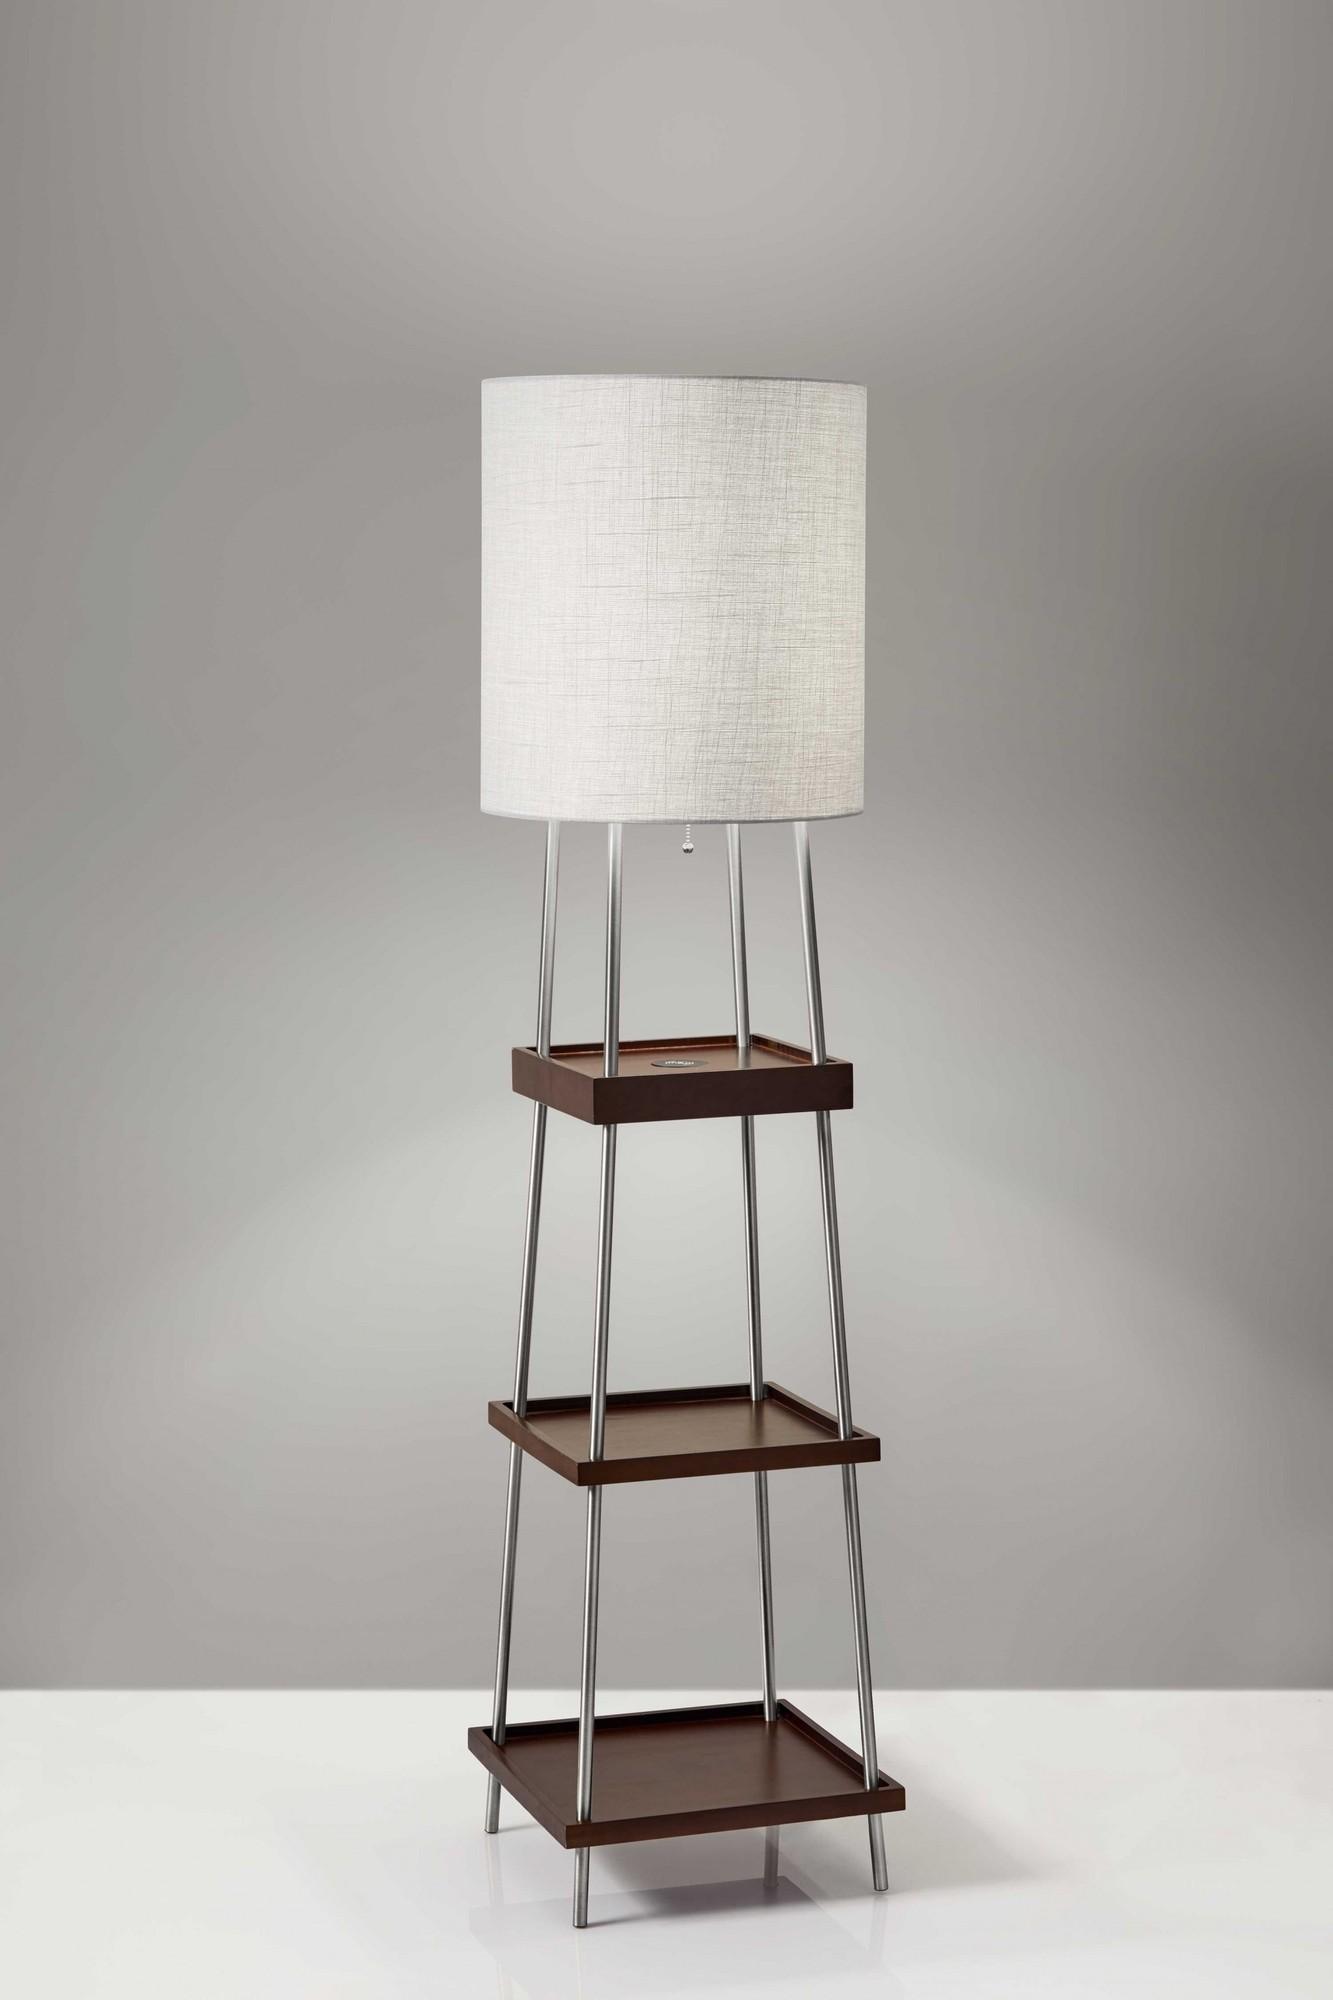 "16"" X 16"" X 63.25"" Walnut Wood Metal Shelf Floor Lamp"